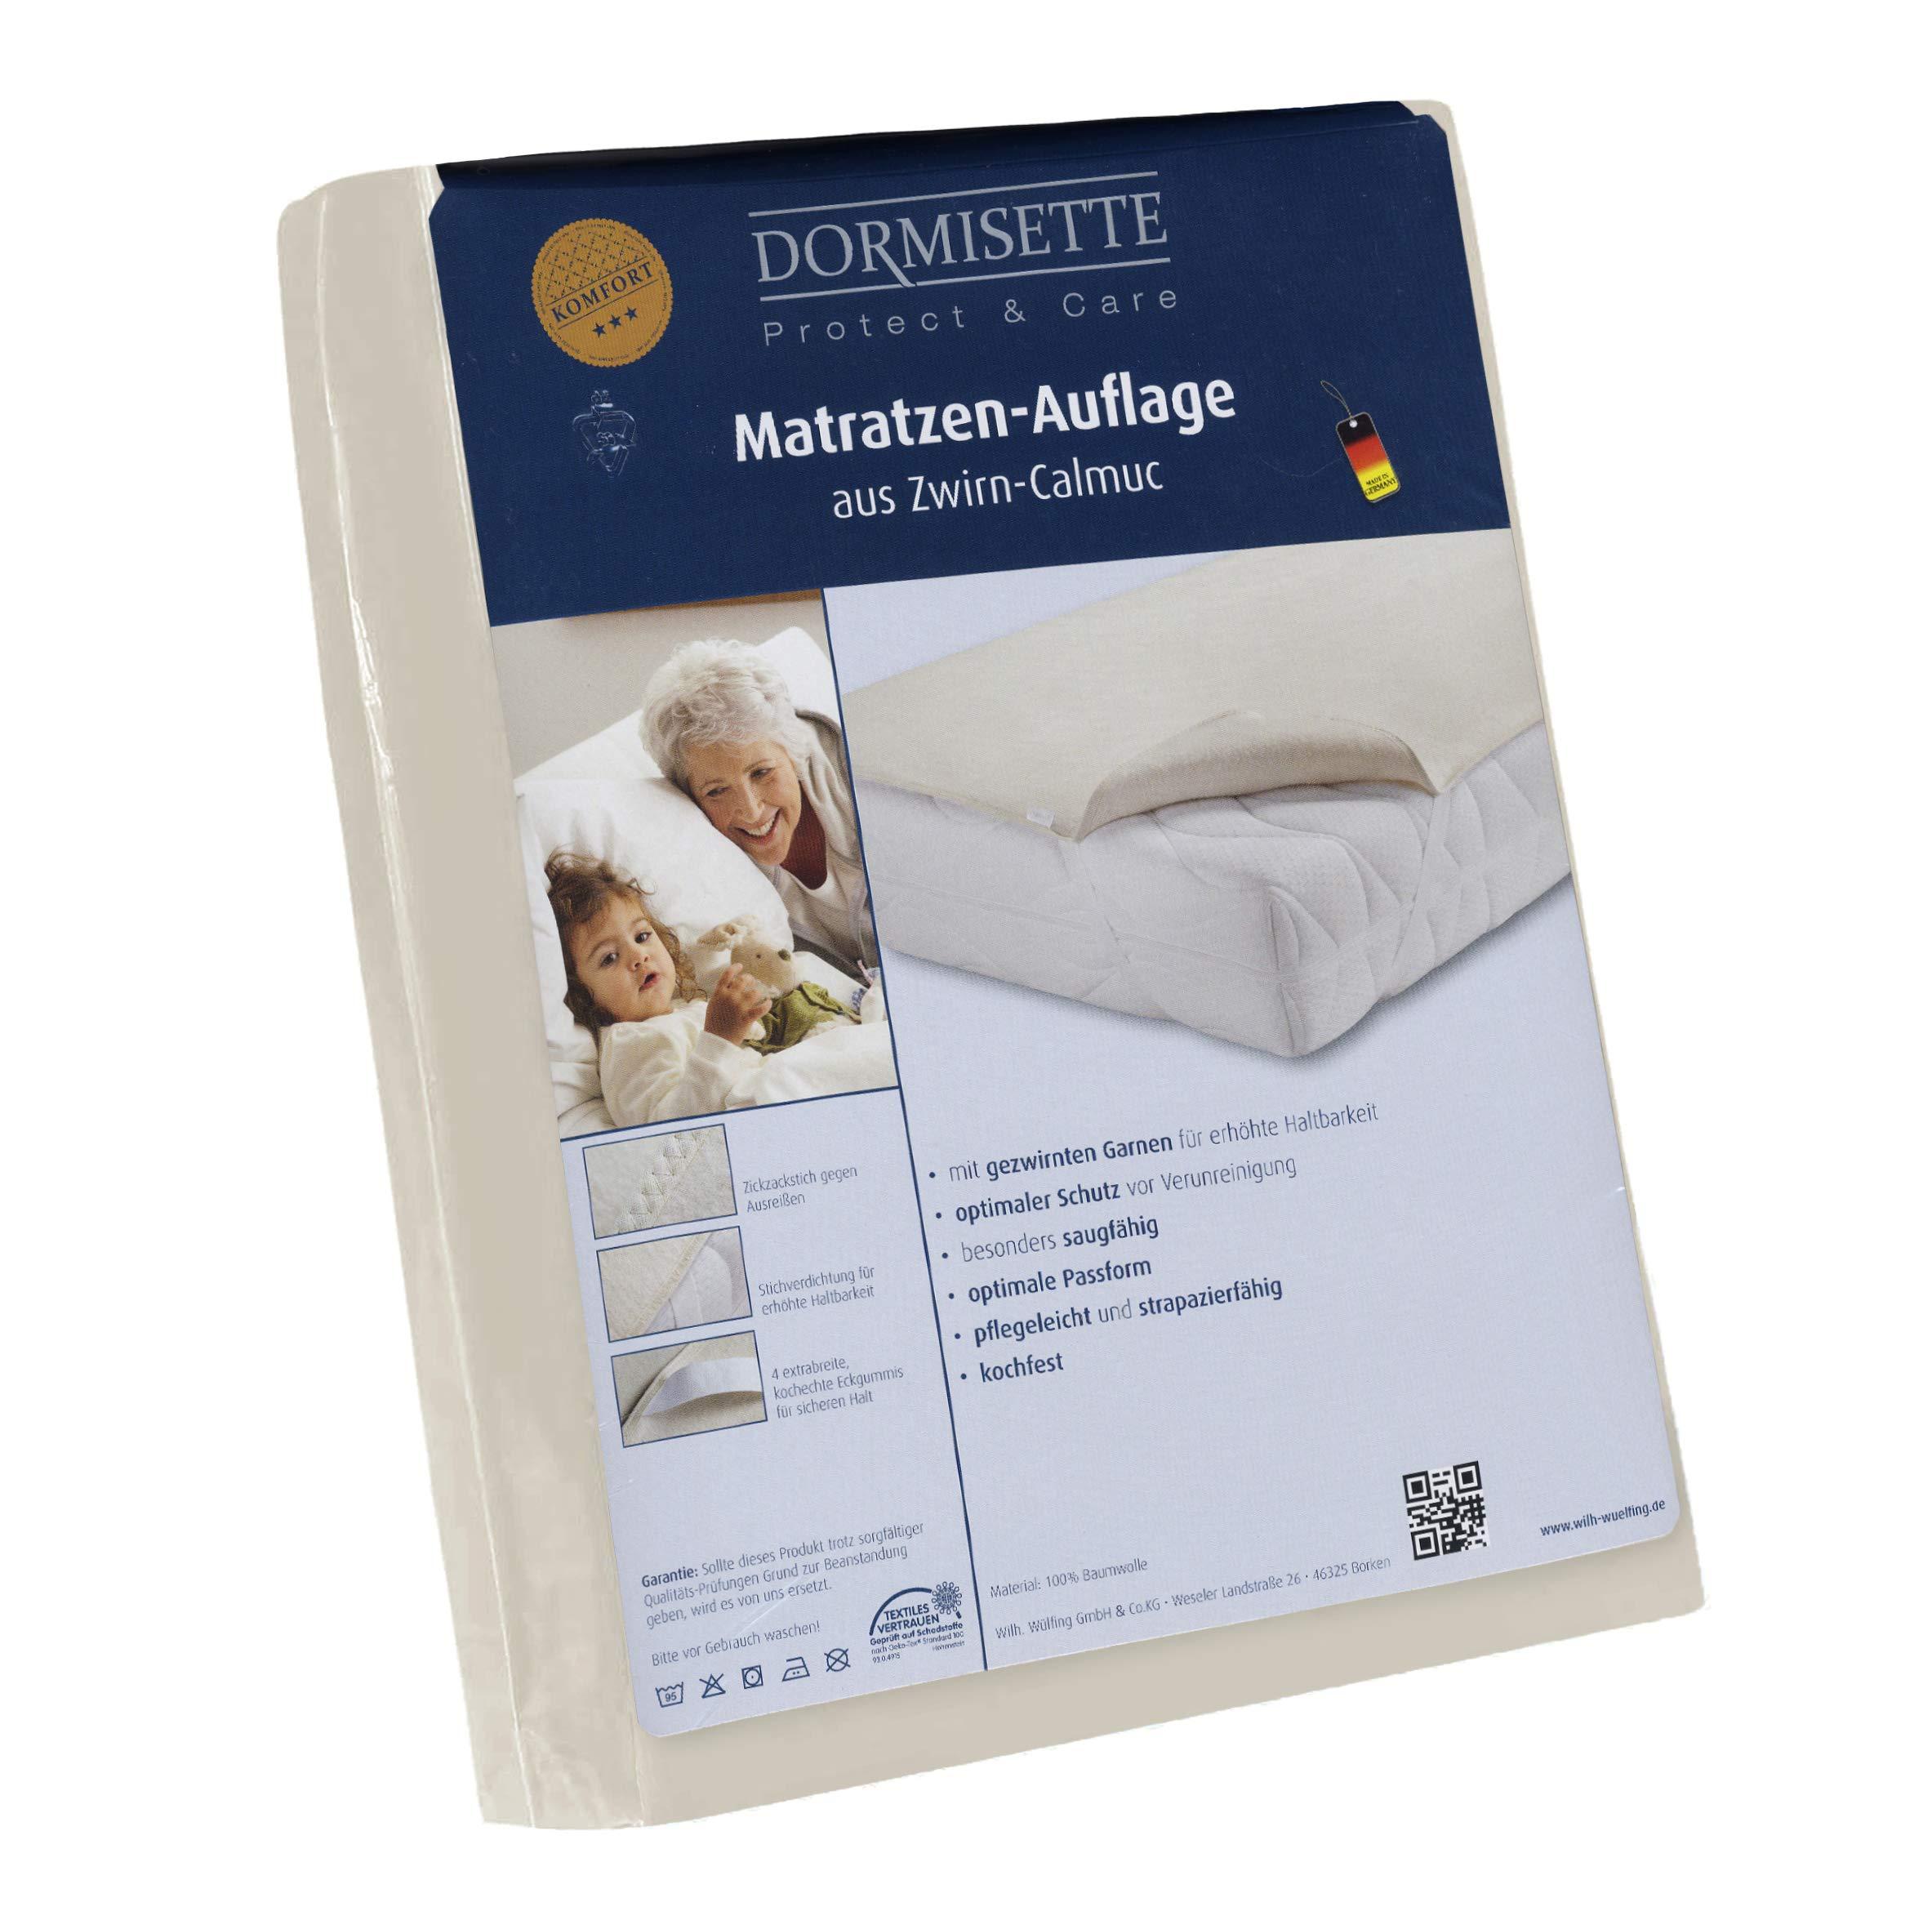 Dormisette Q59 Molton Matratzenauflage, 90200 cm, Baumwolle